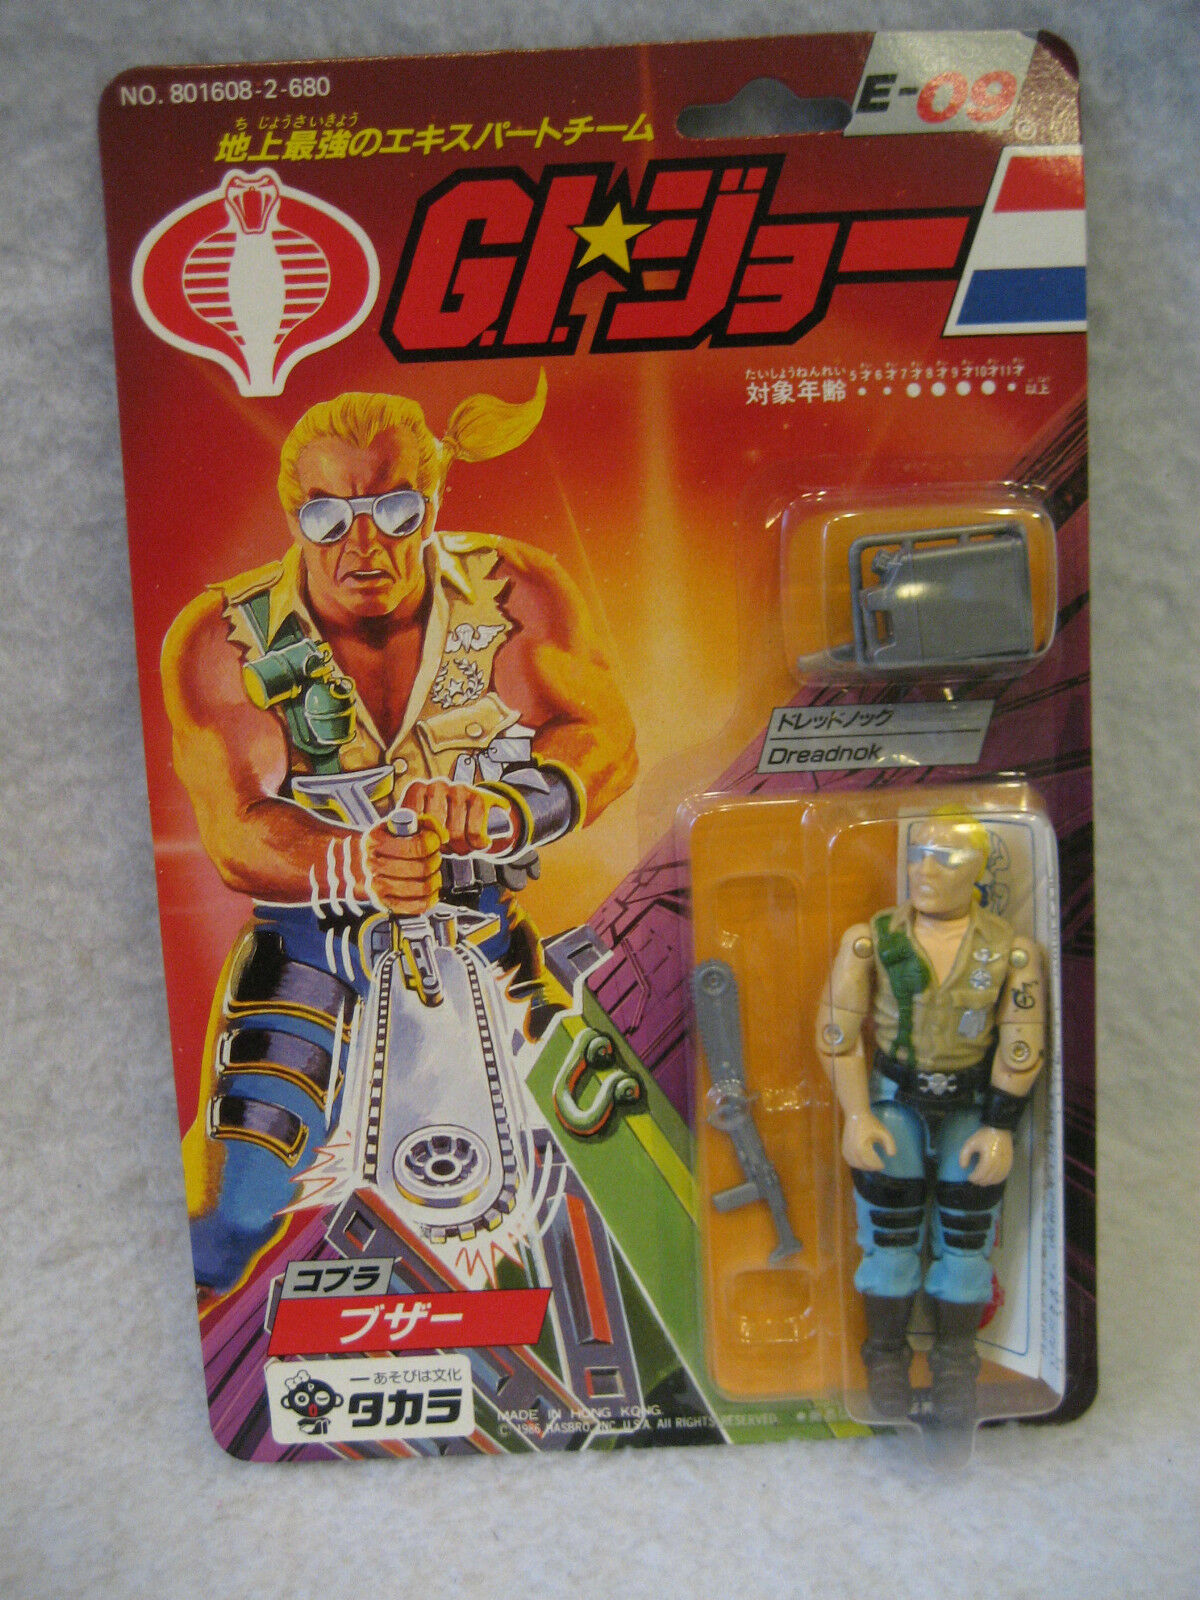 SEALED vintage GI Joe BUZZER action figure MOC Japan Dreadnok Takara Japanese